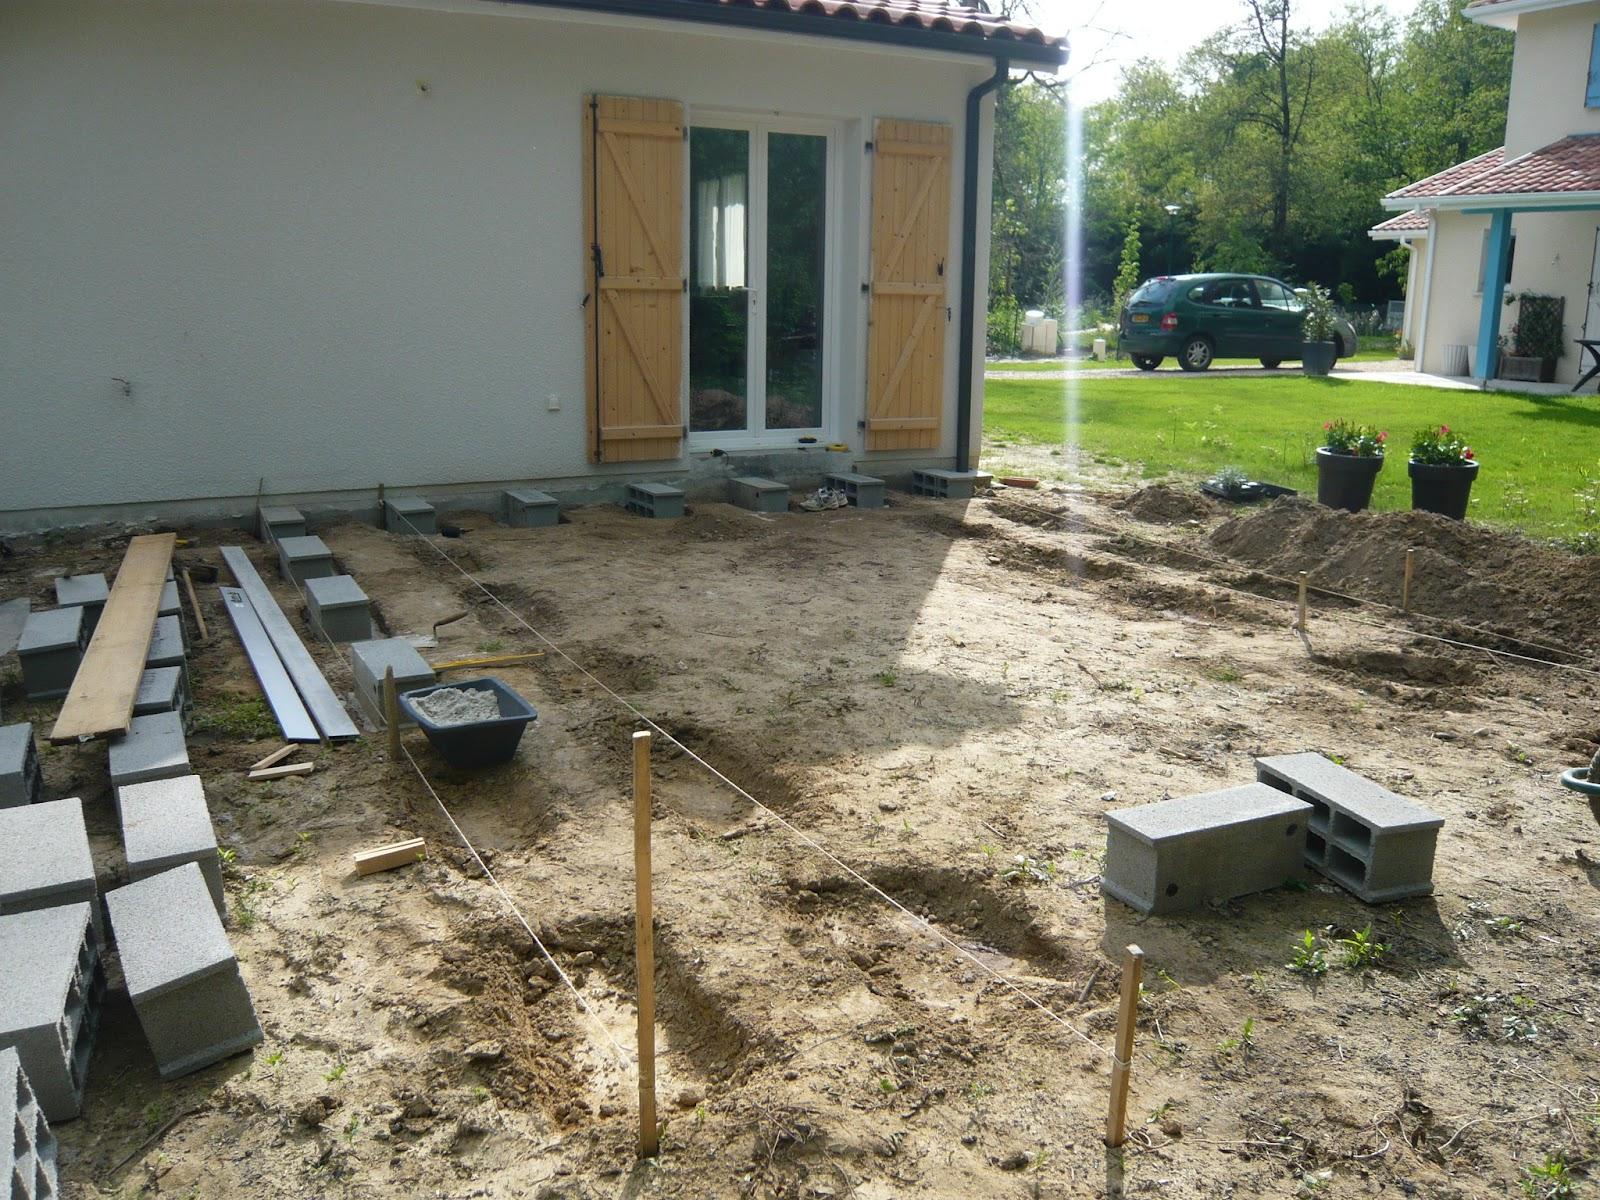 Construire Une Terrasse En Bois Surelevee construction terrasse bois construction terrasse bois